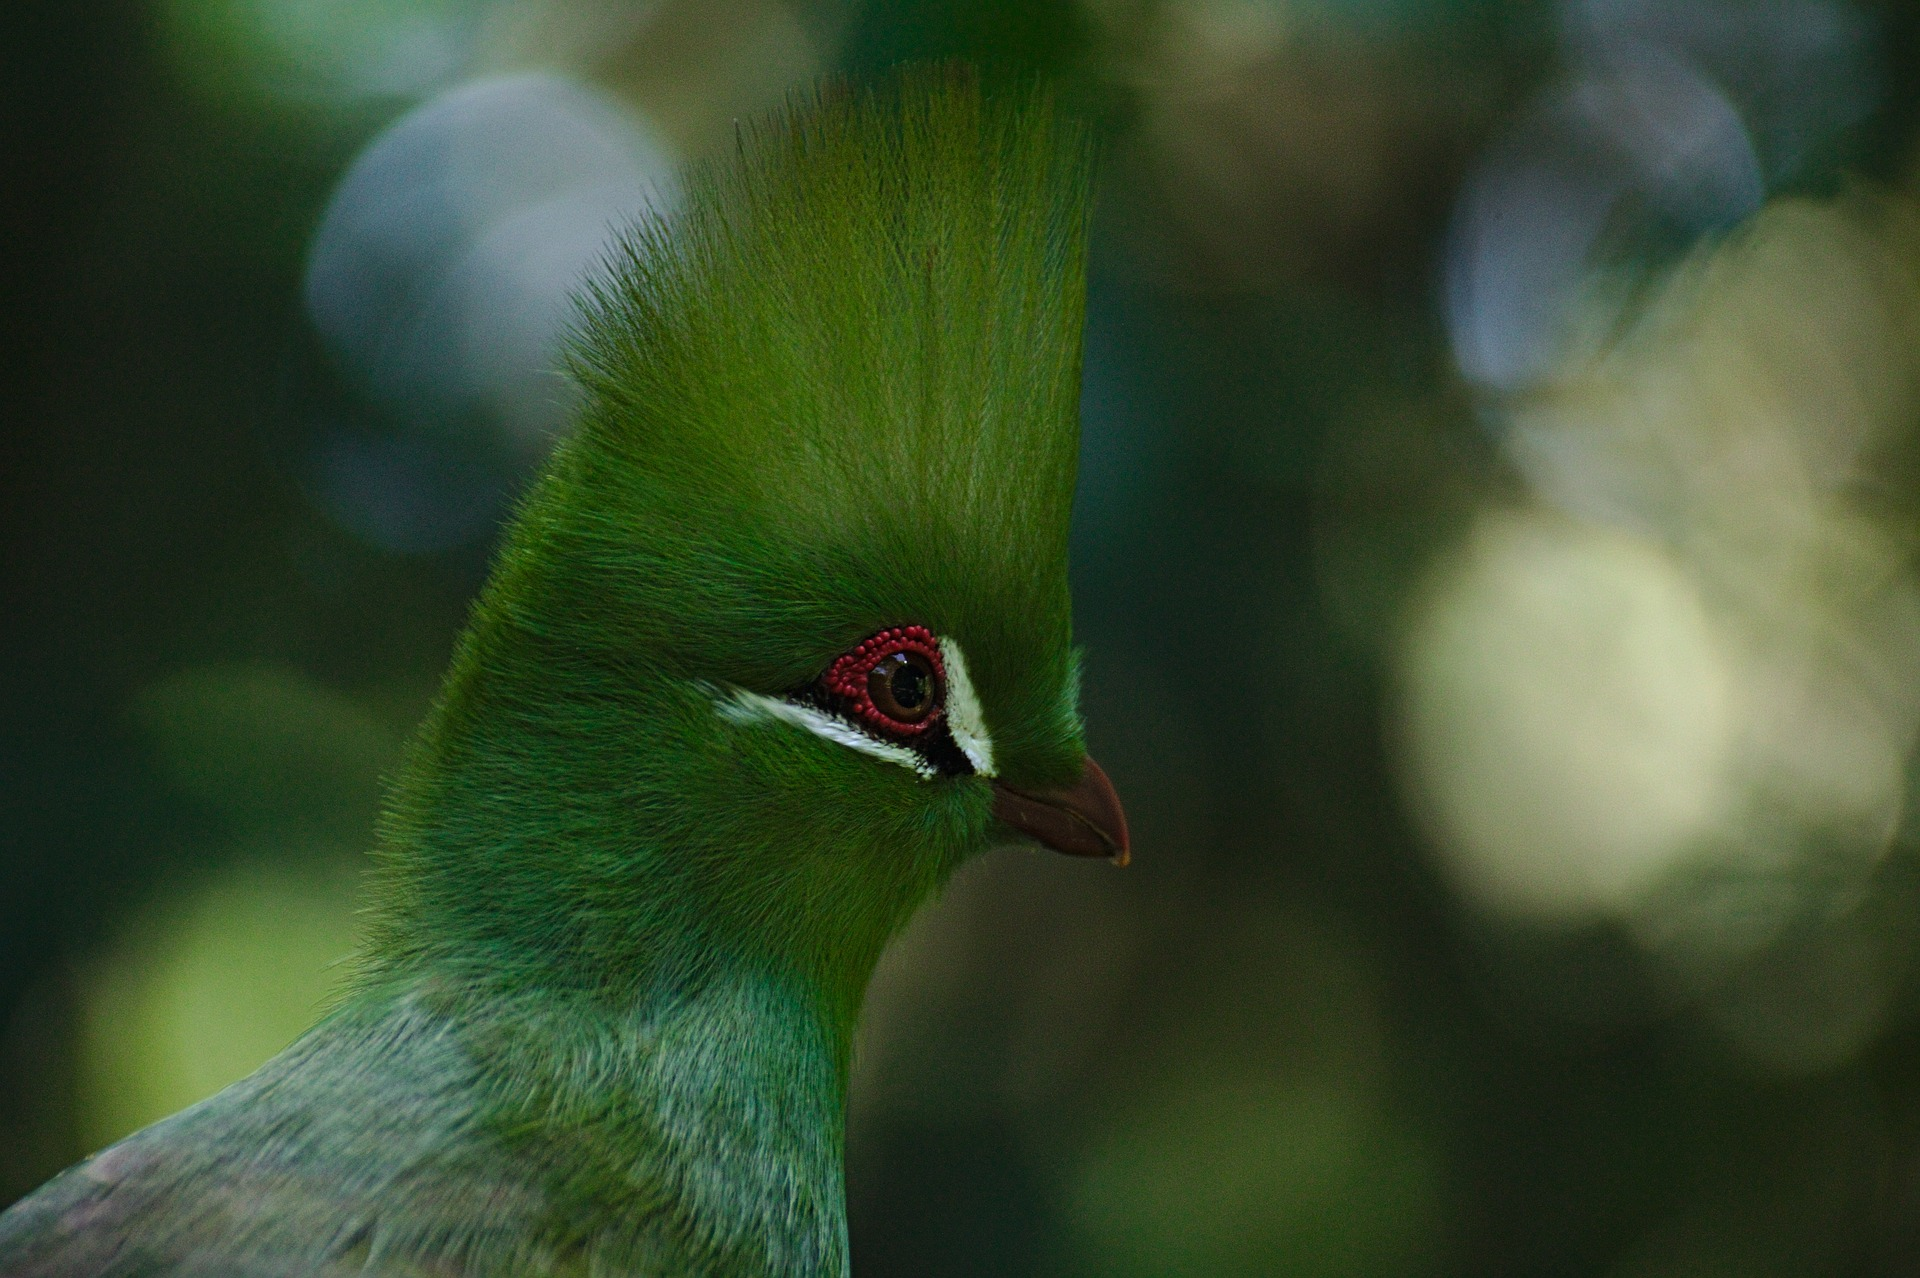 bird-3561871_1920.jpg